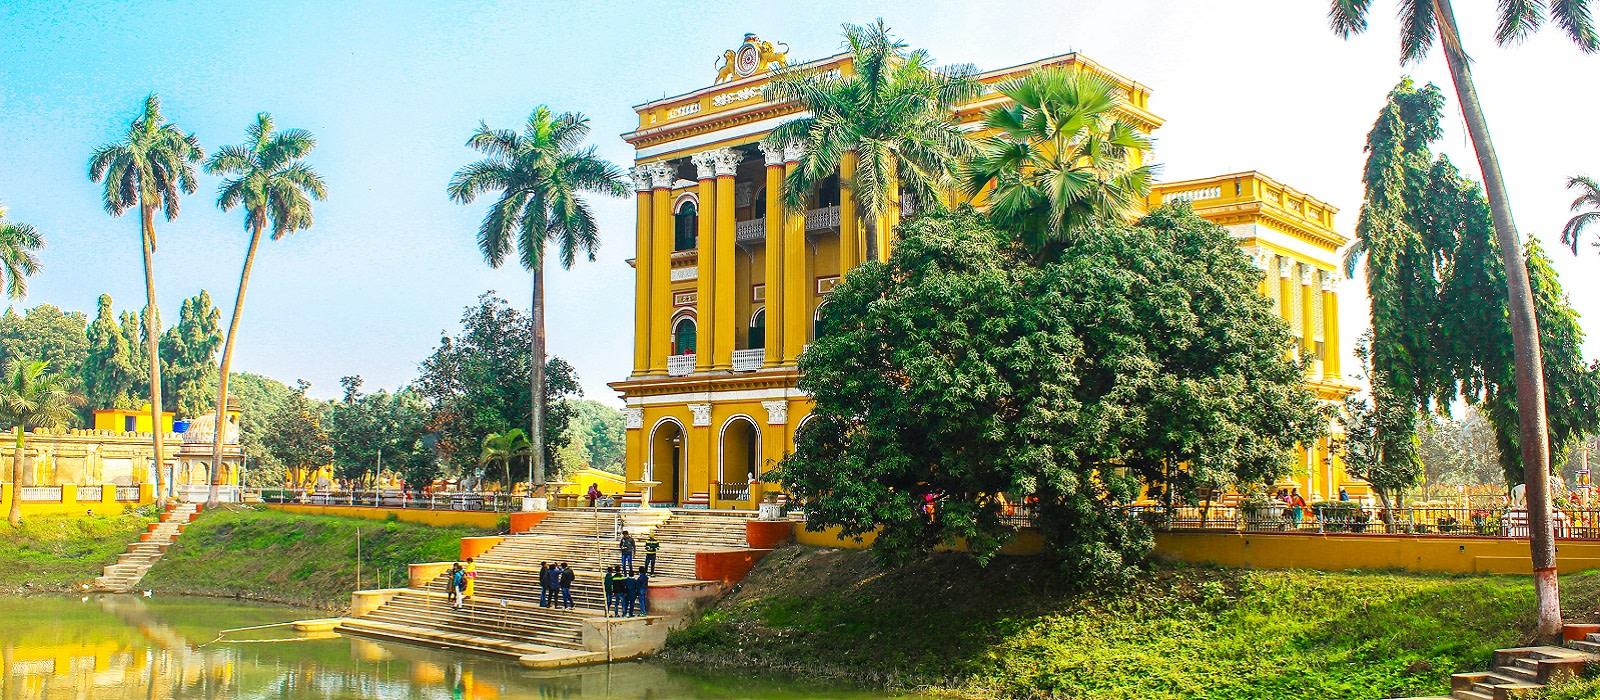 Reiseziel Murshidabad Ostindien